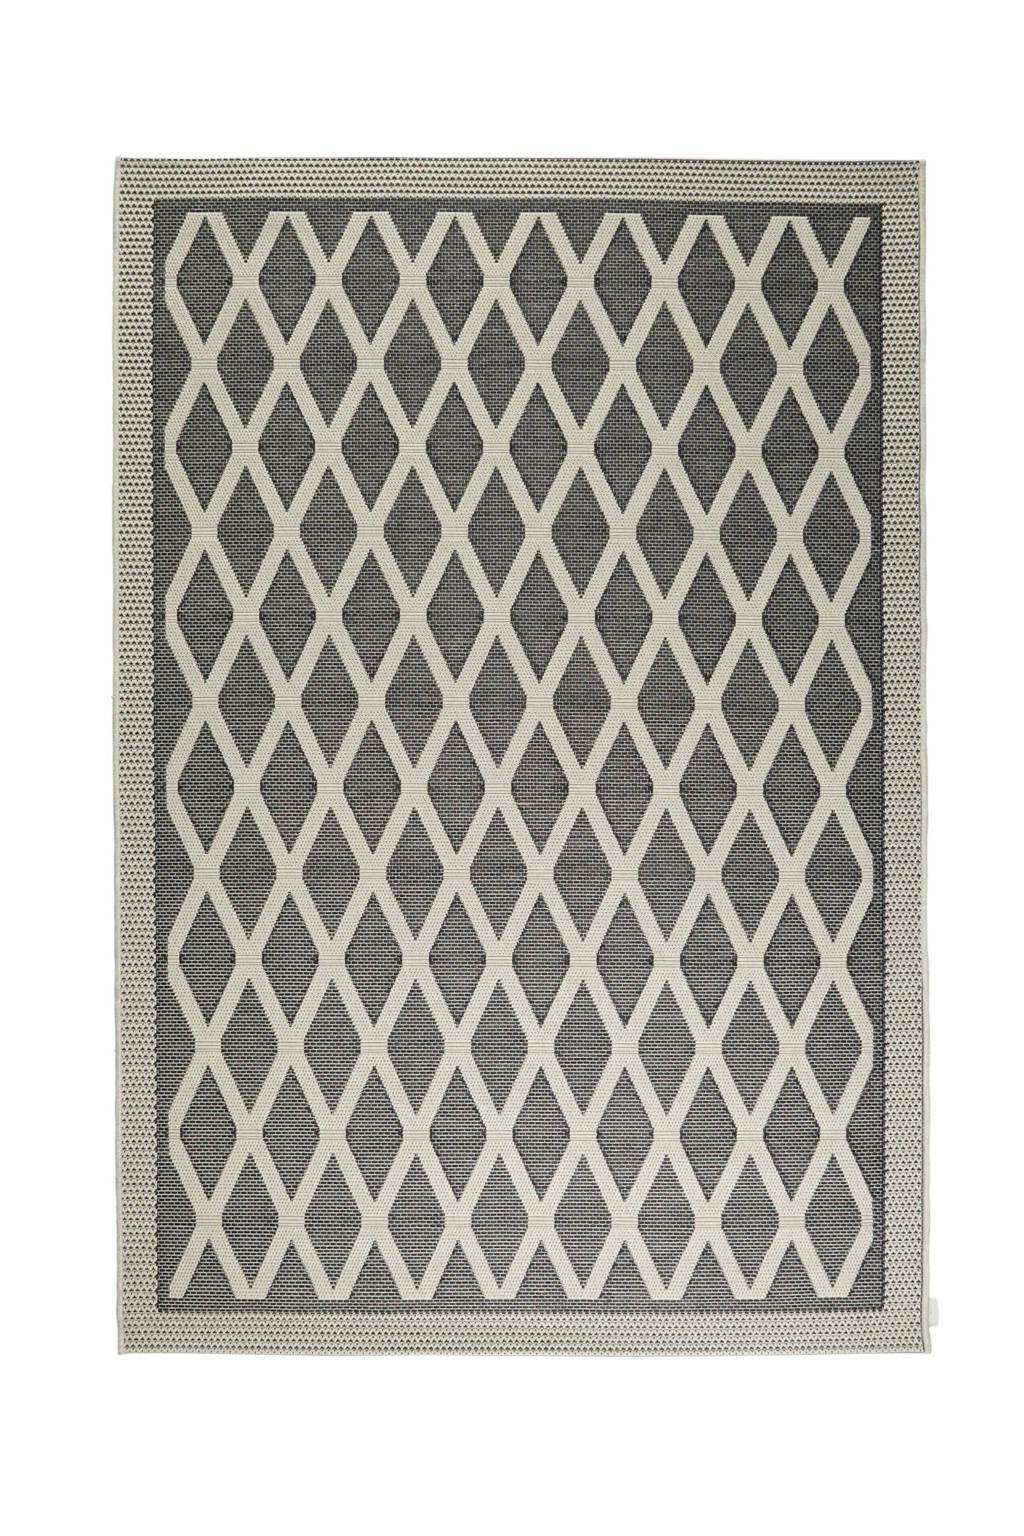 whkmp's own Vloerkleed  (230x155 cm), Zwart/wit